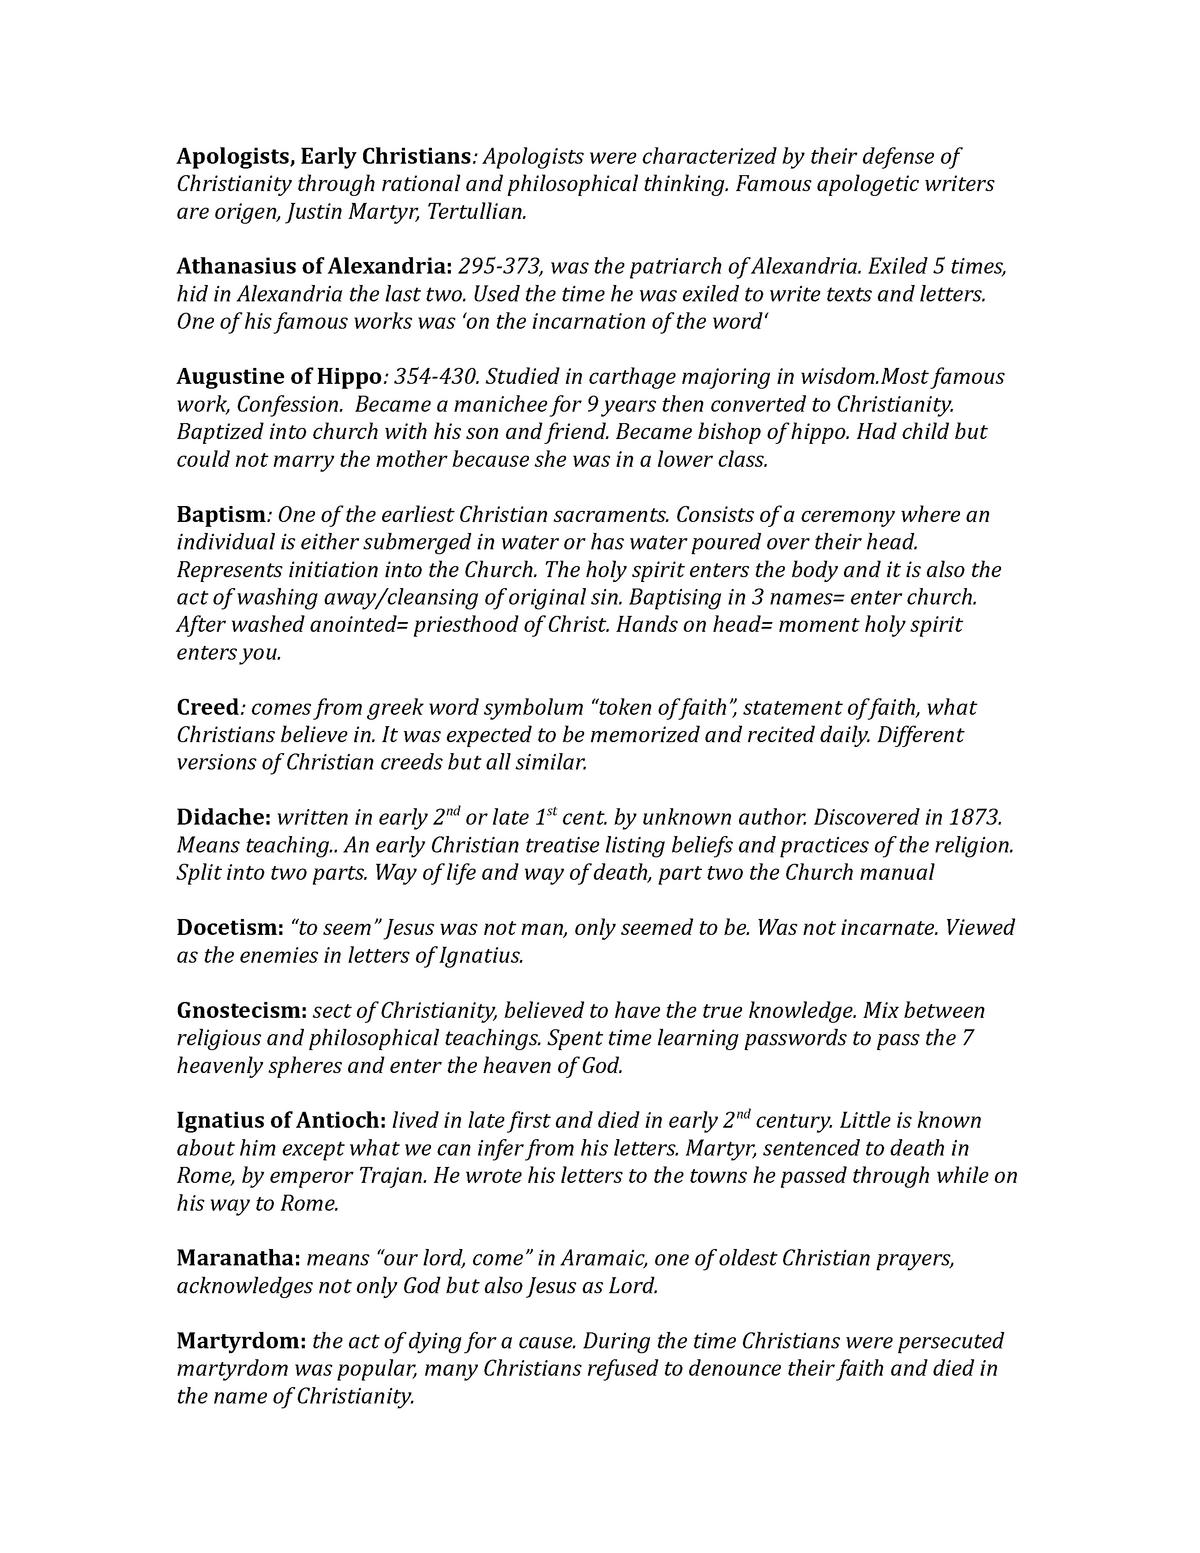 Theo-Vocab List - THEO 2610 Early Christian Writings - StuDocu